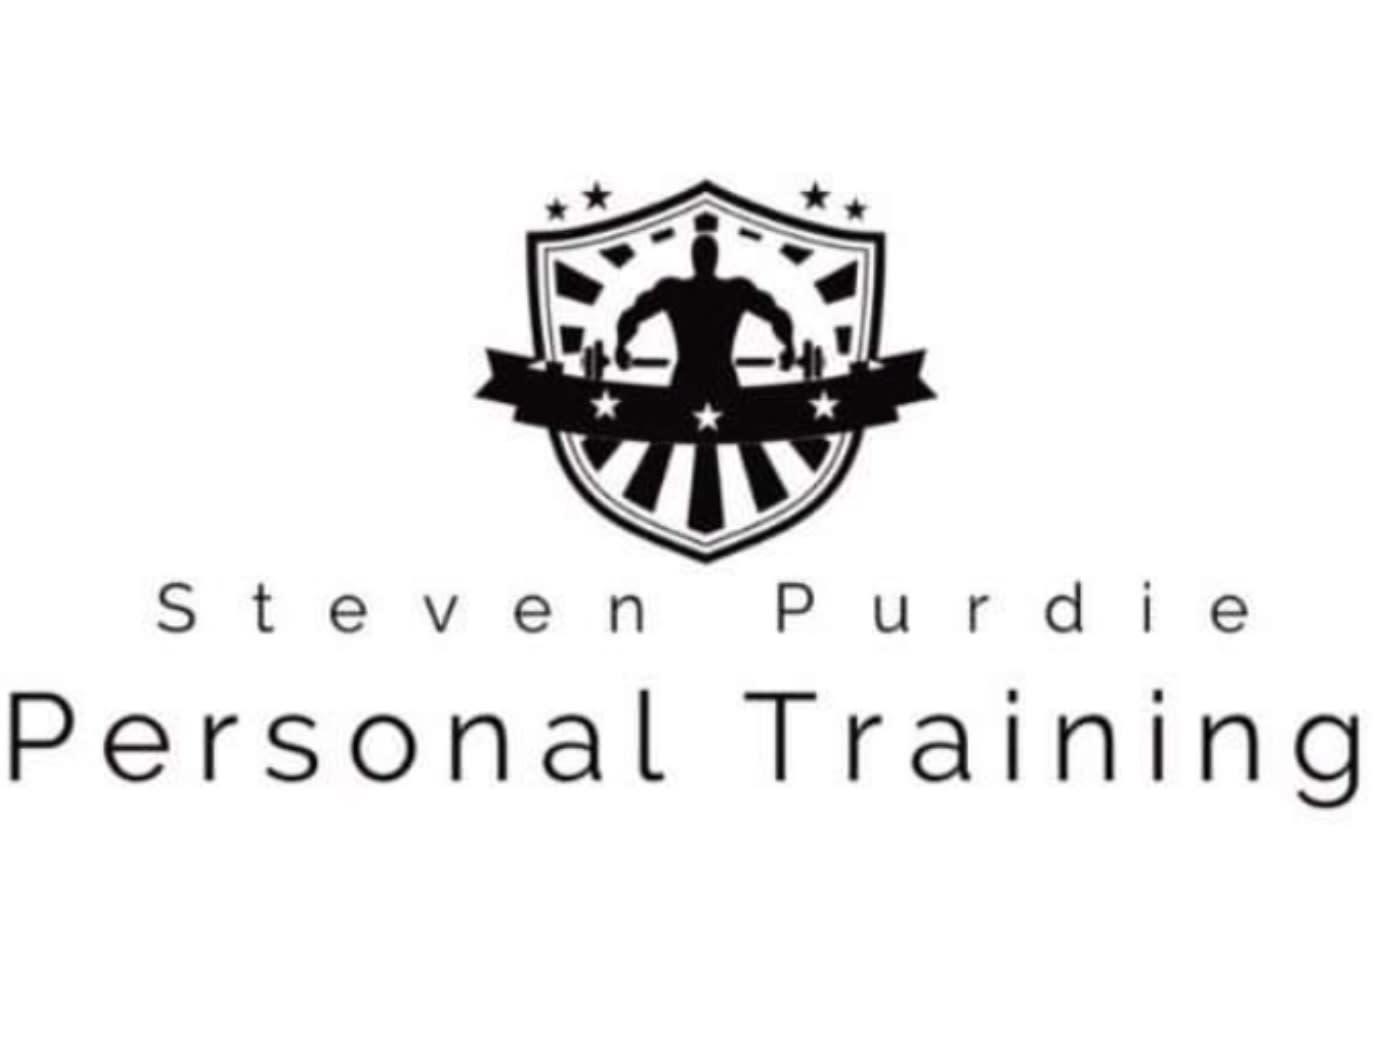 Steven Purdie Personal Training